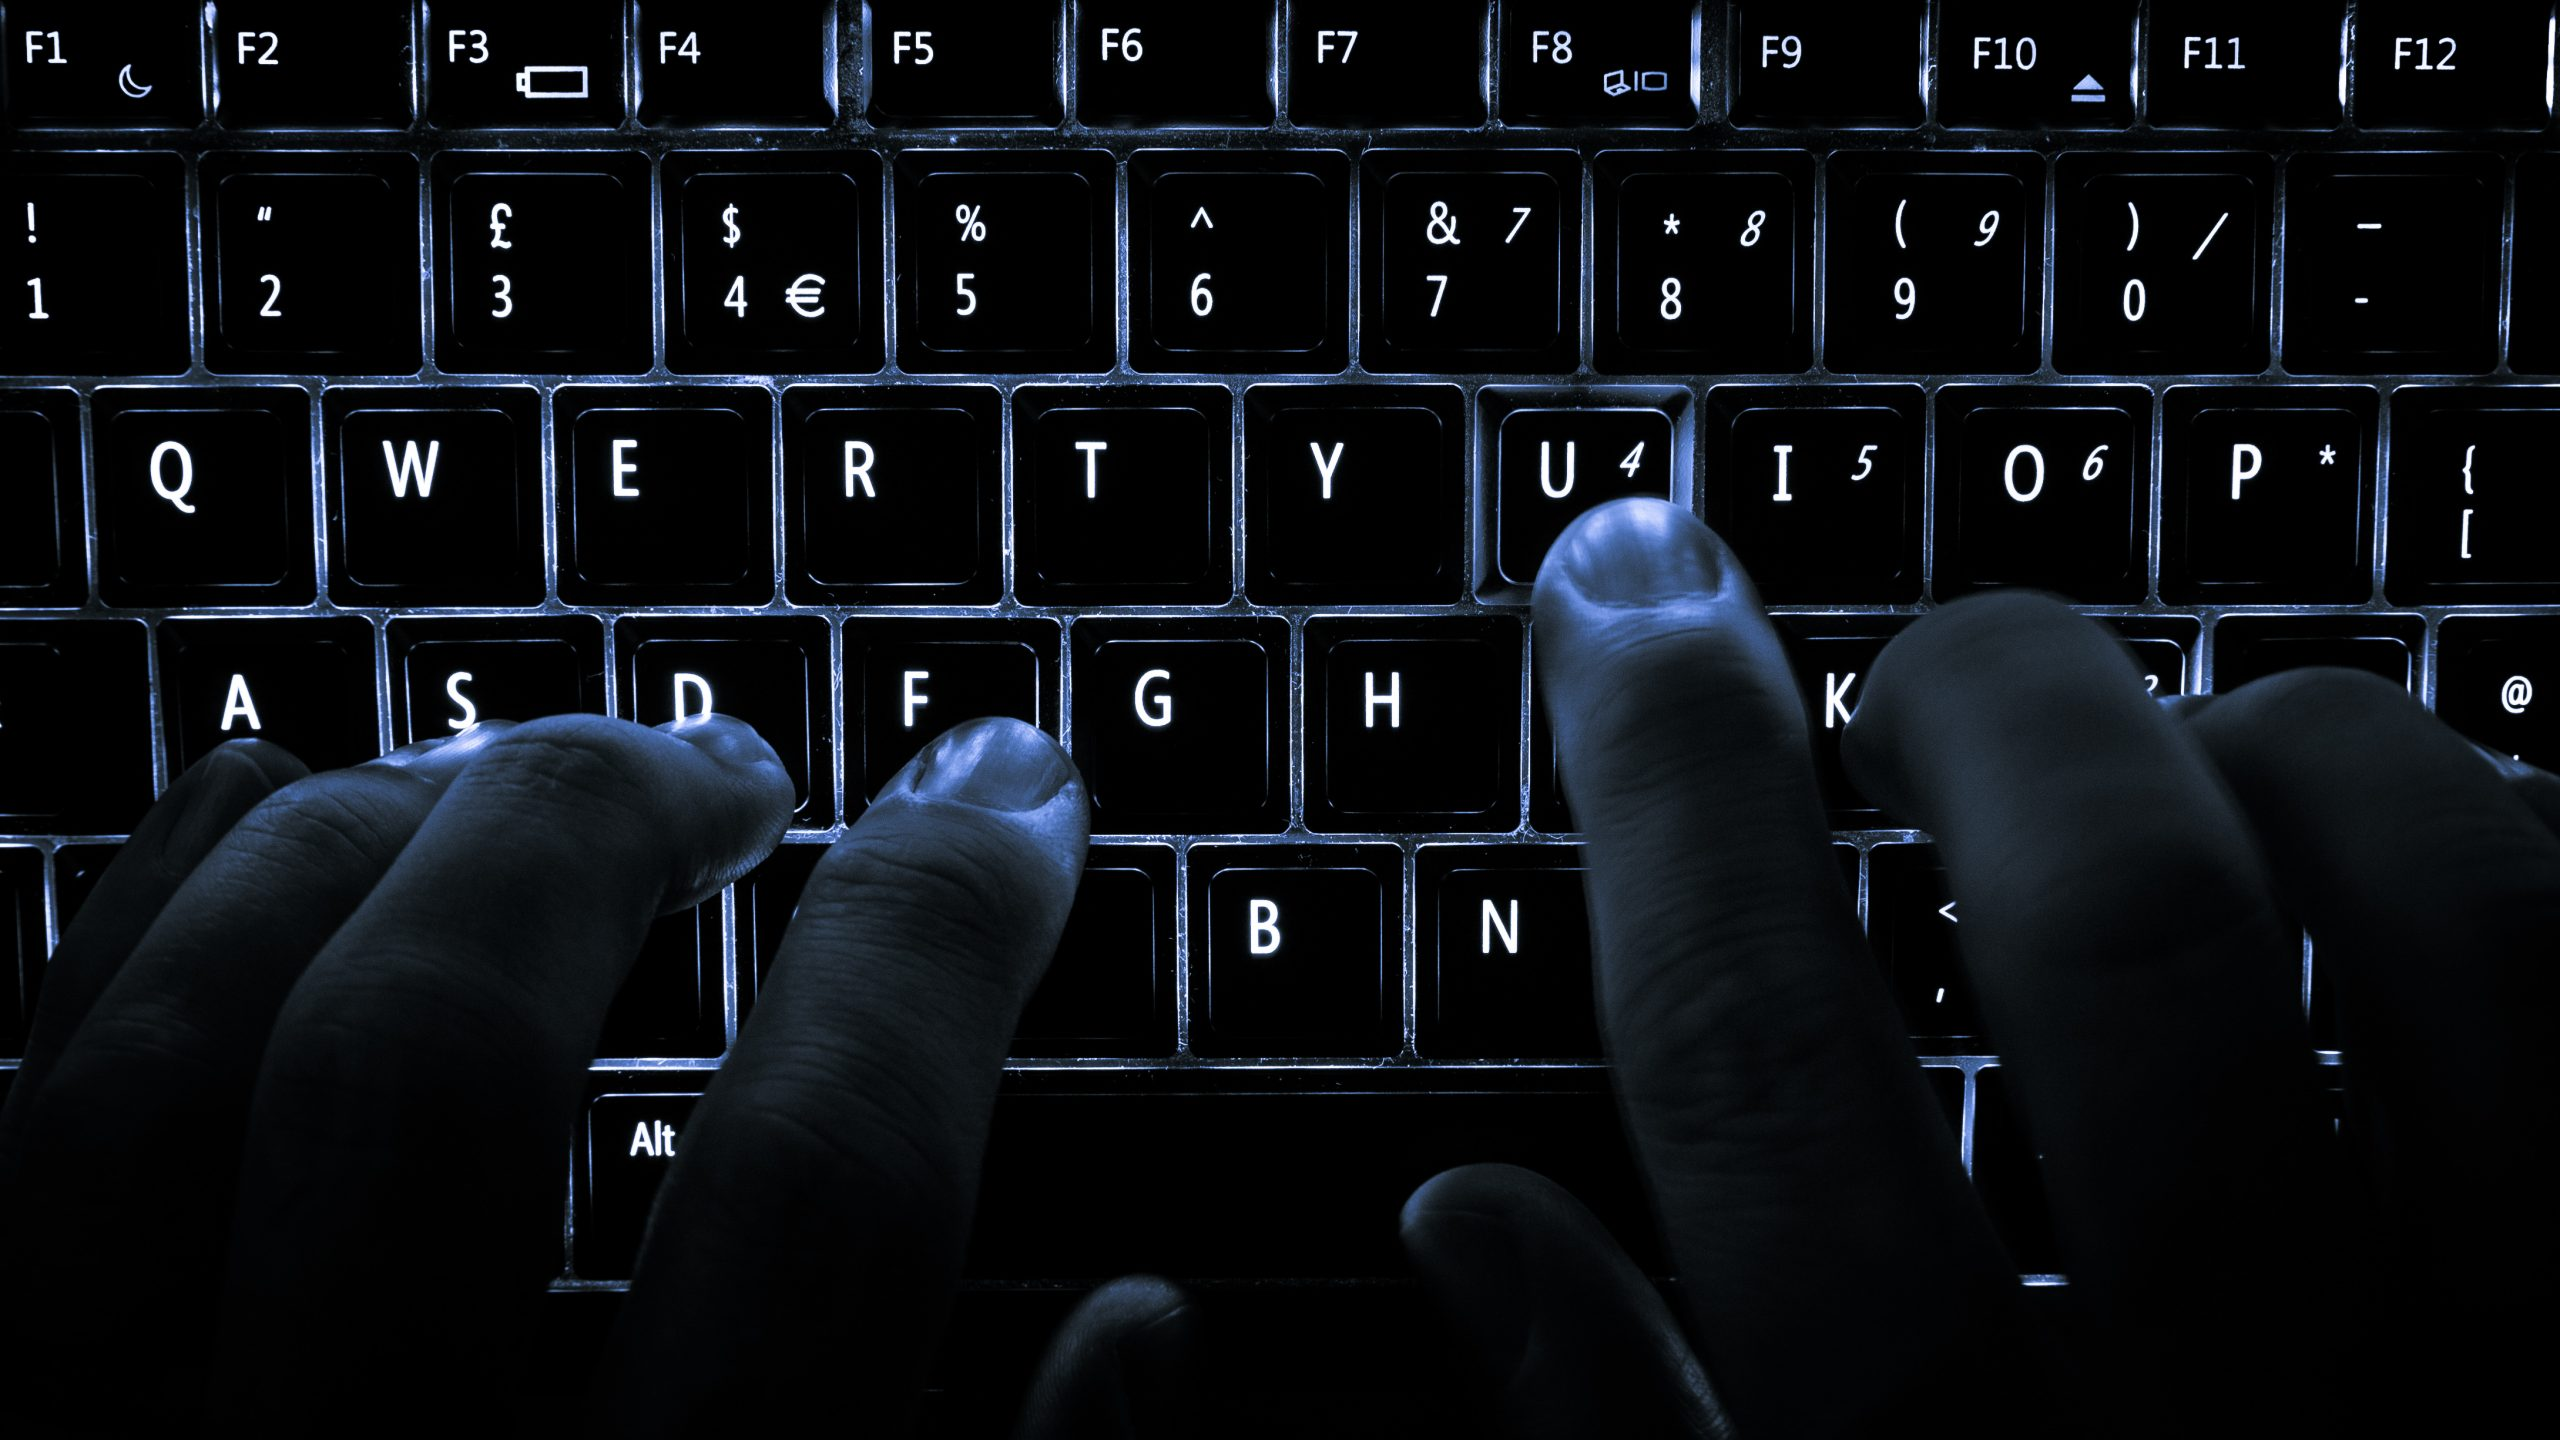 Carlson Wagonlit Travel (CWT) har afværget et cyberangreb. Foto: Colin, CC 4.0